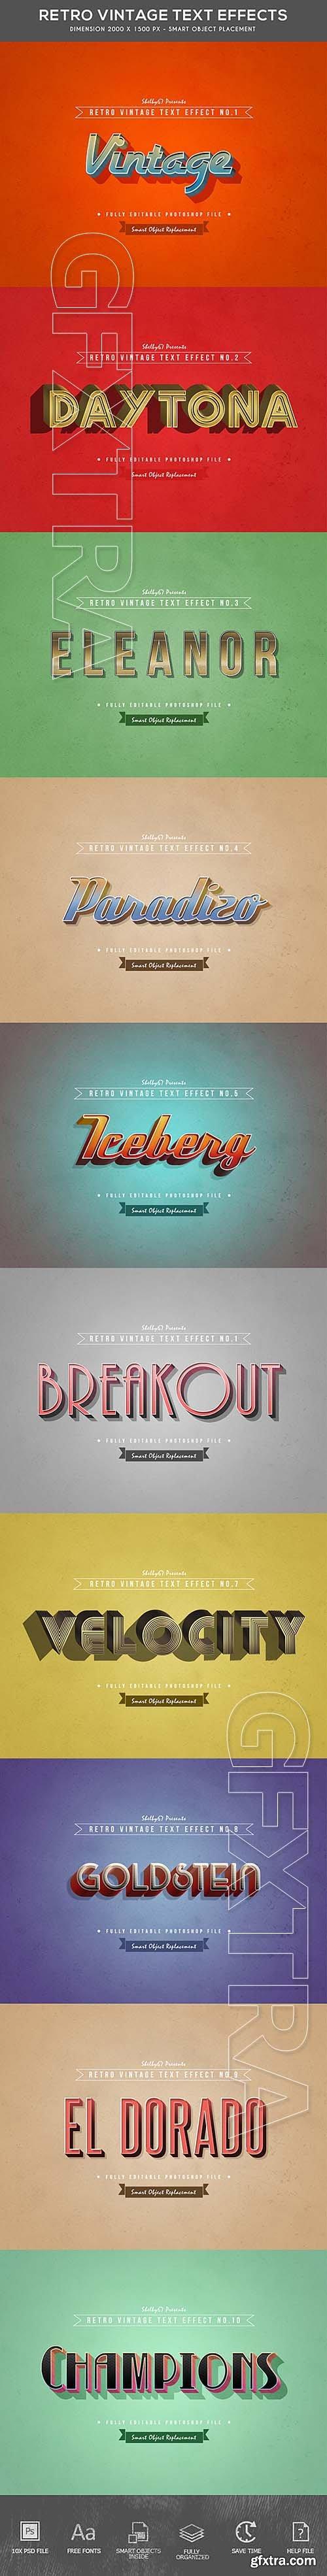 GraphicRiver - Retro Vintage Text Effects 21142668